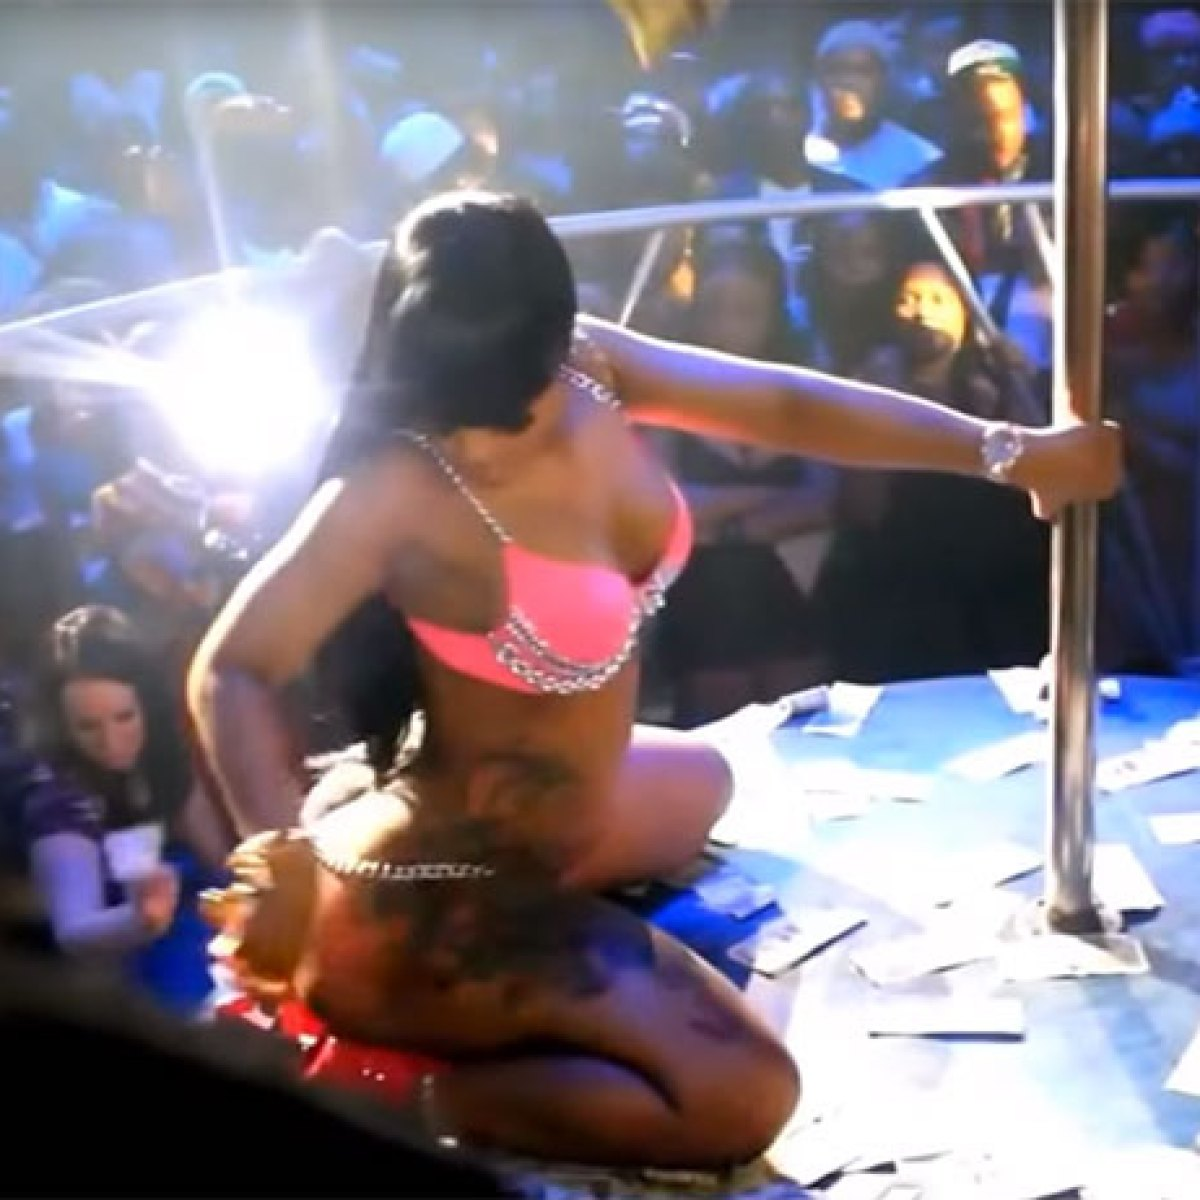 Blac Chyna as a stripper